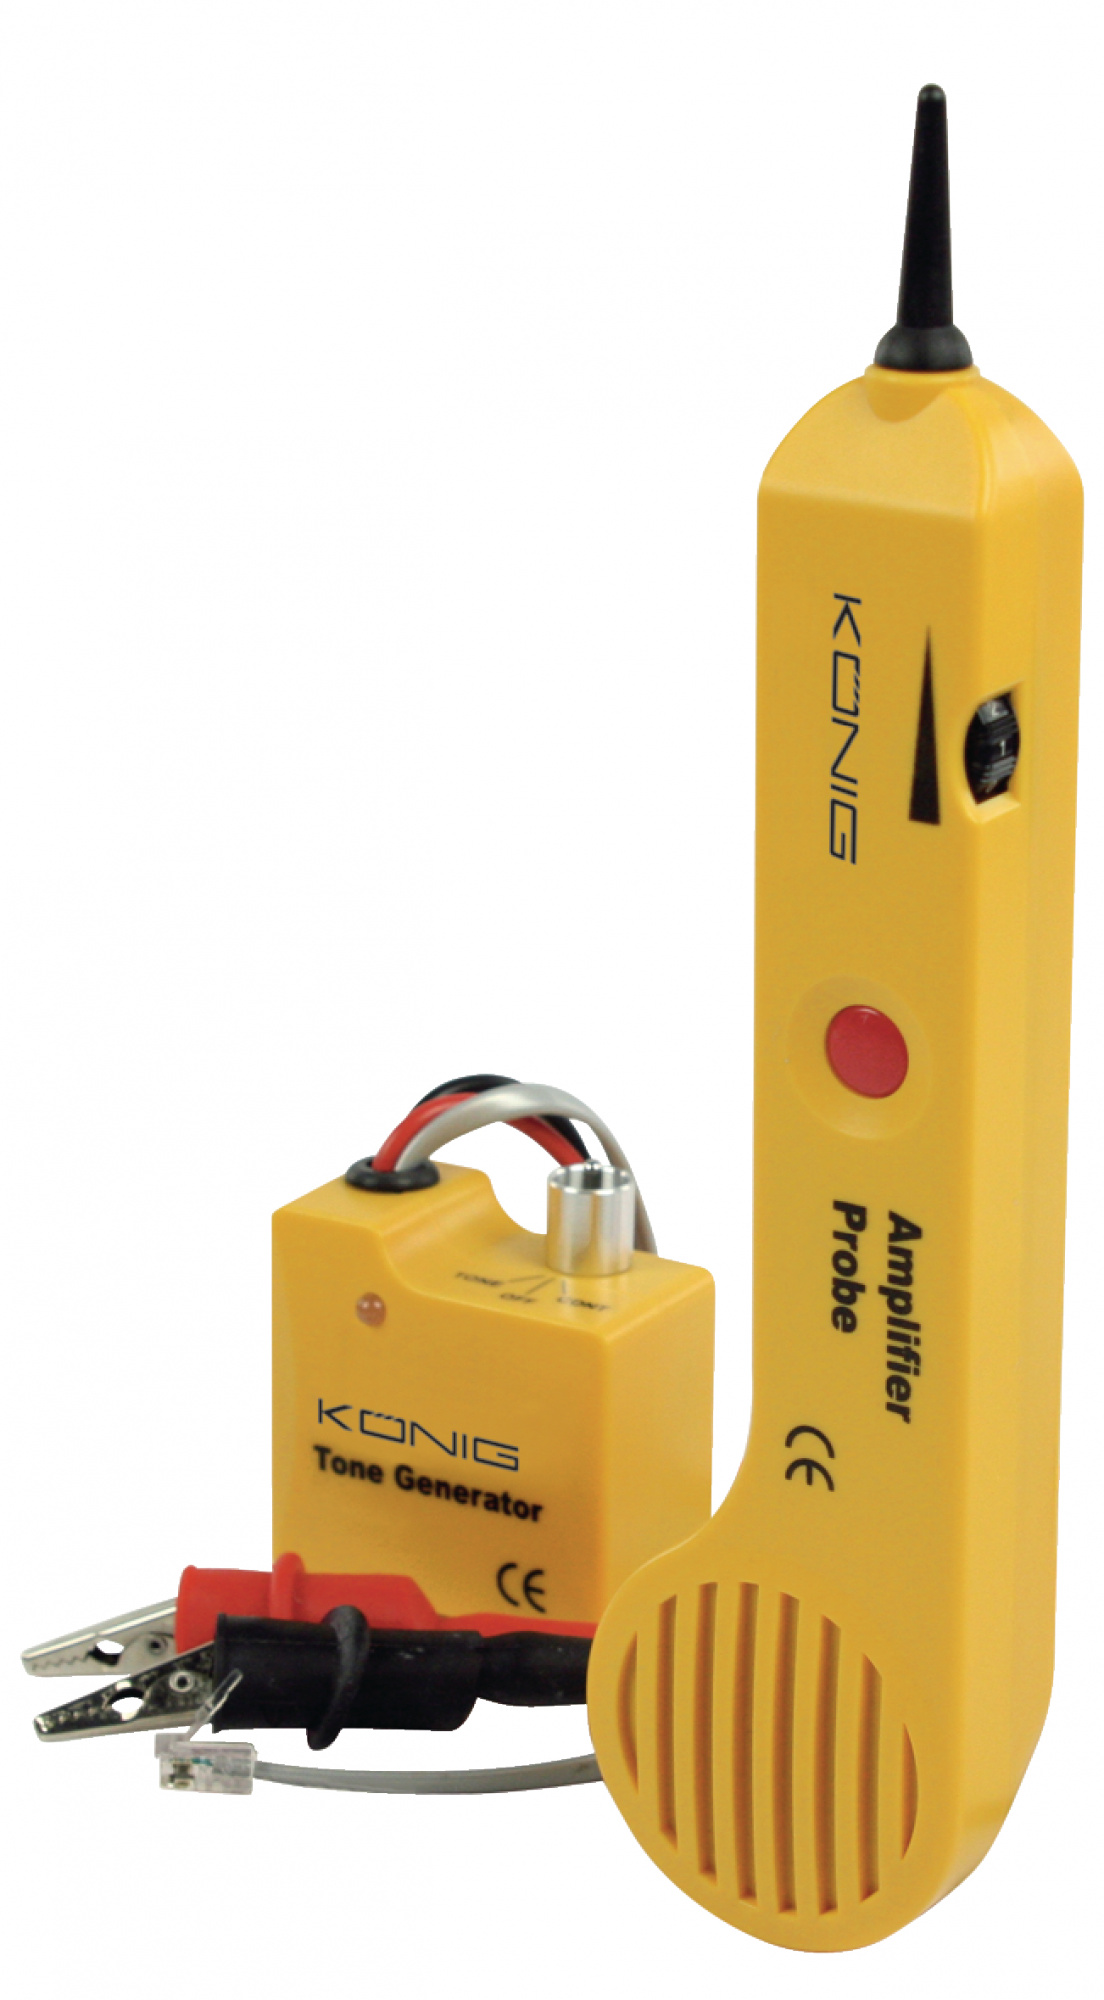 Tone Kit Tone Generator and Probe